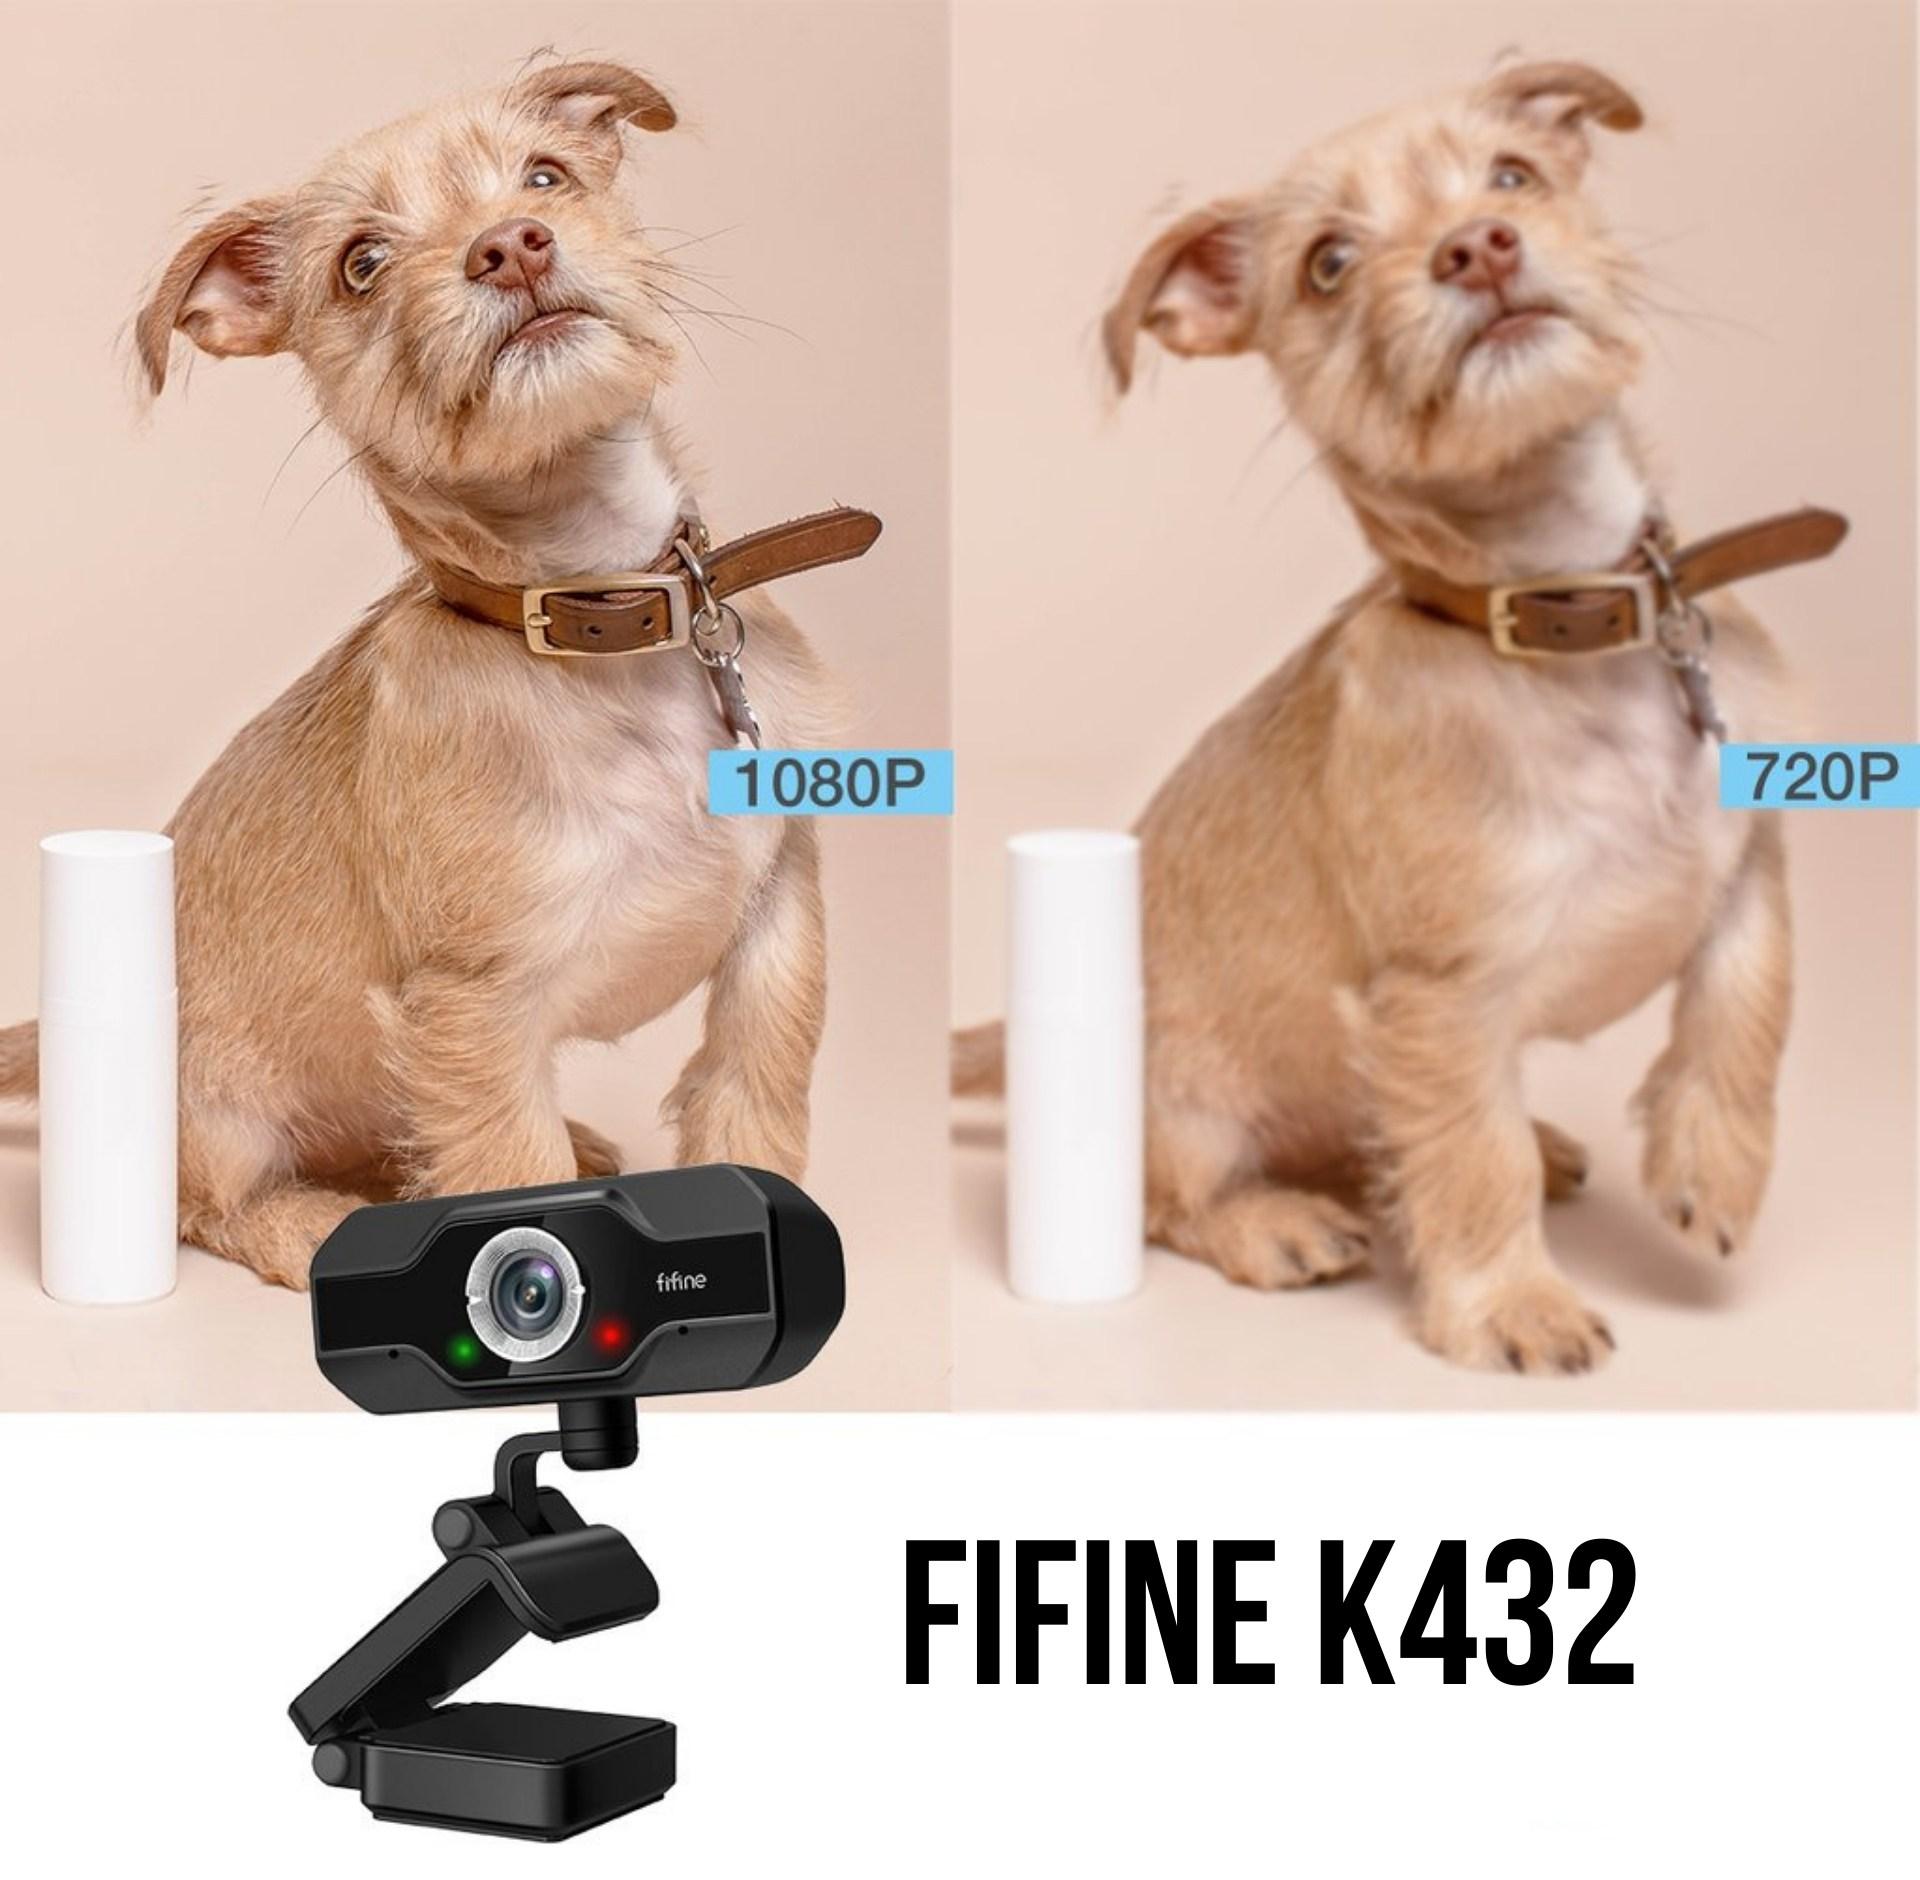 FIFINE K432.jpg